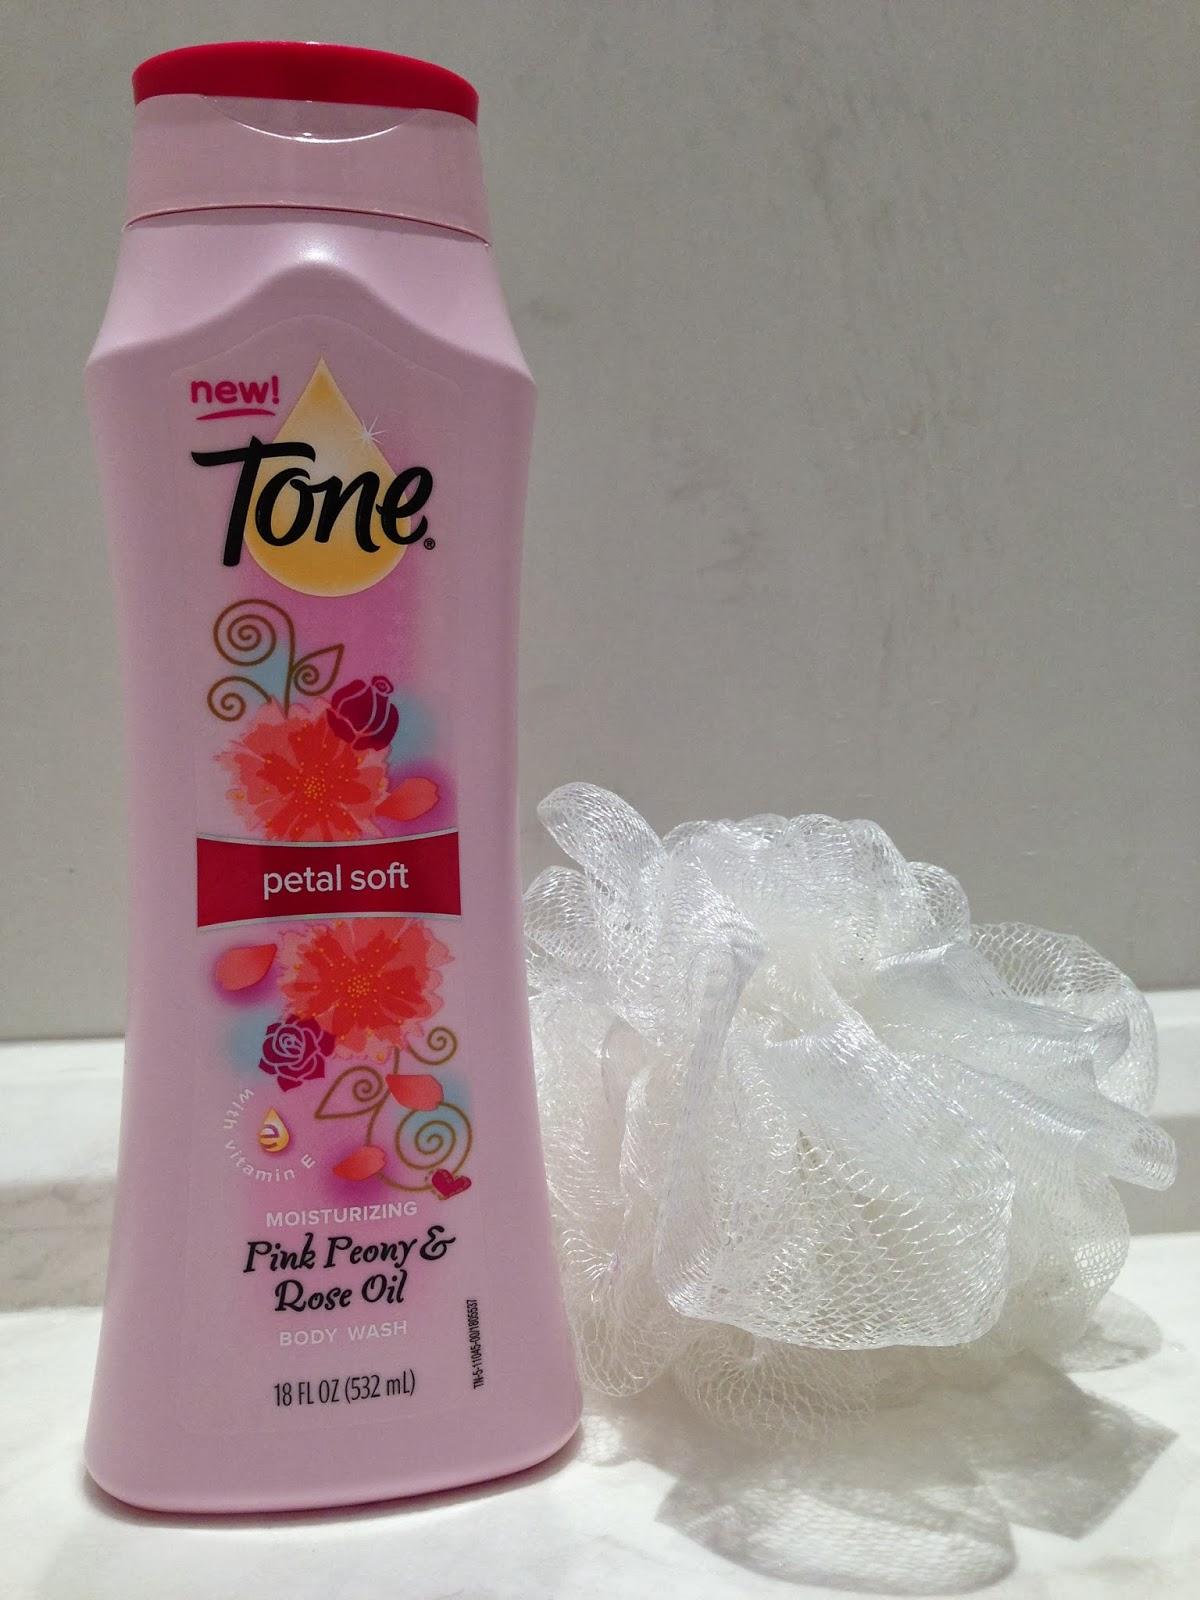 Tone Petal Soft Bath and Body Wash Review - Won Over! | SAHM